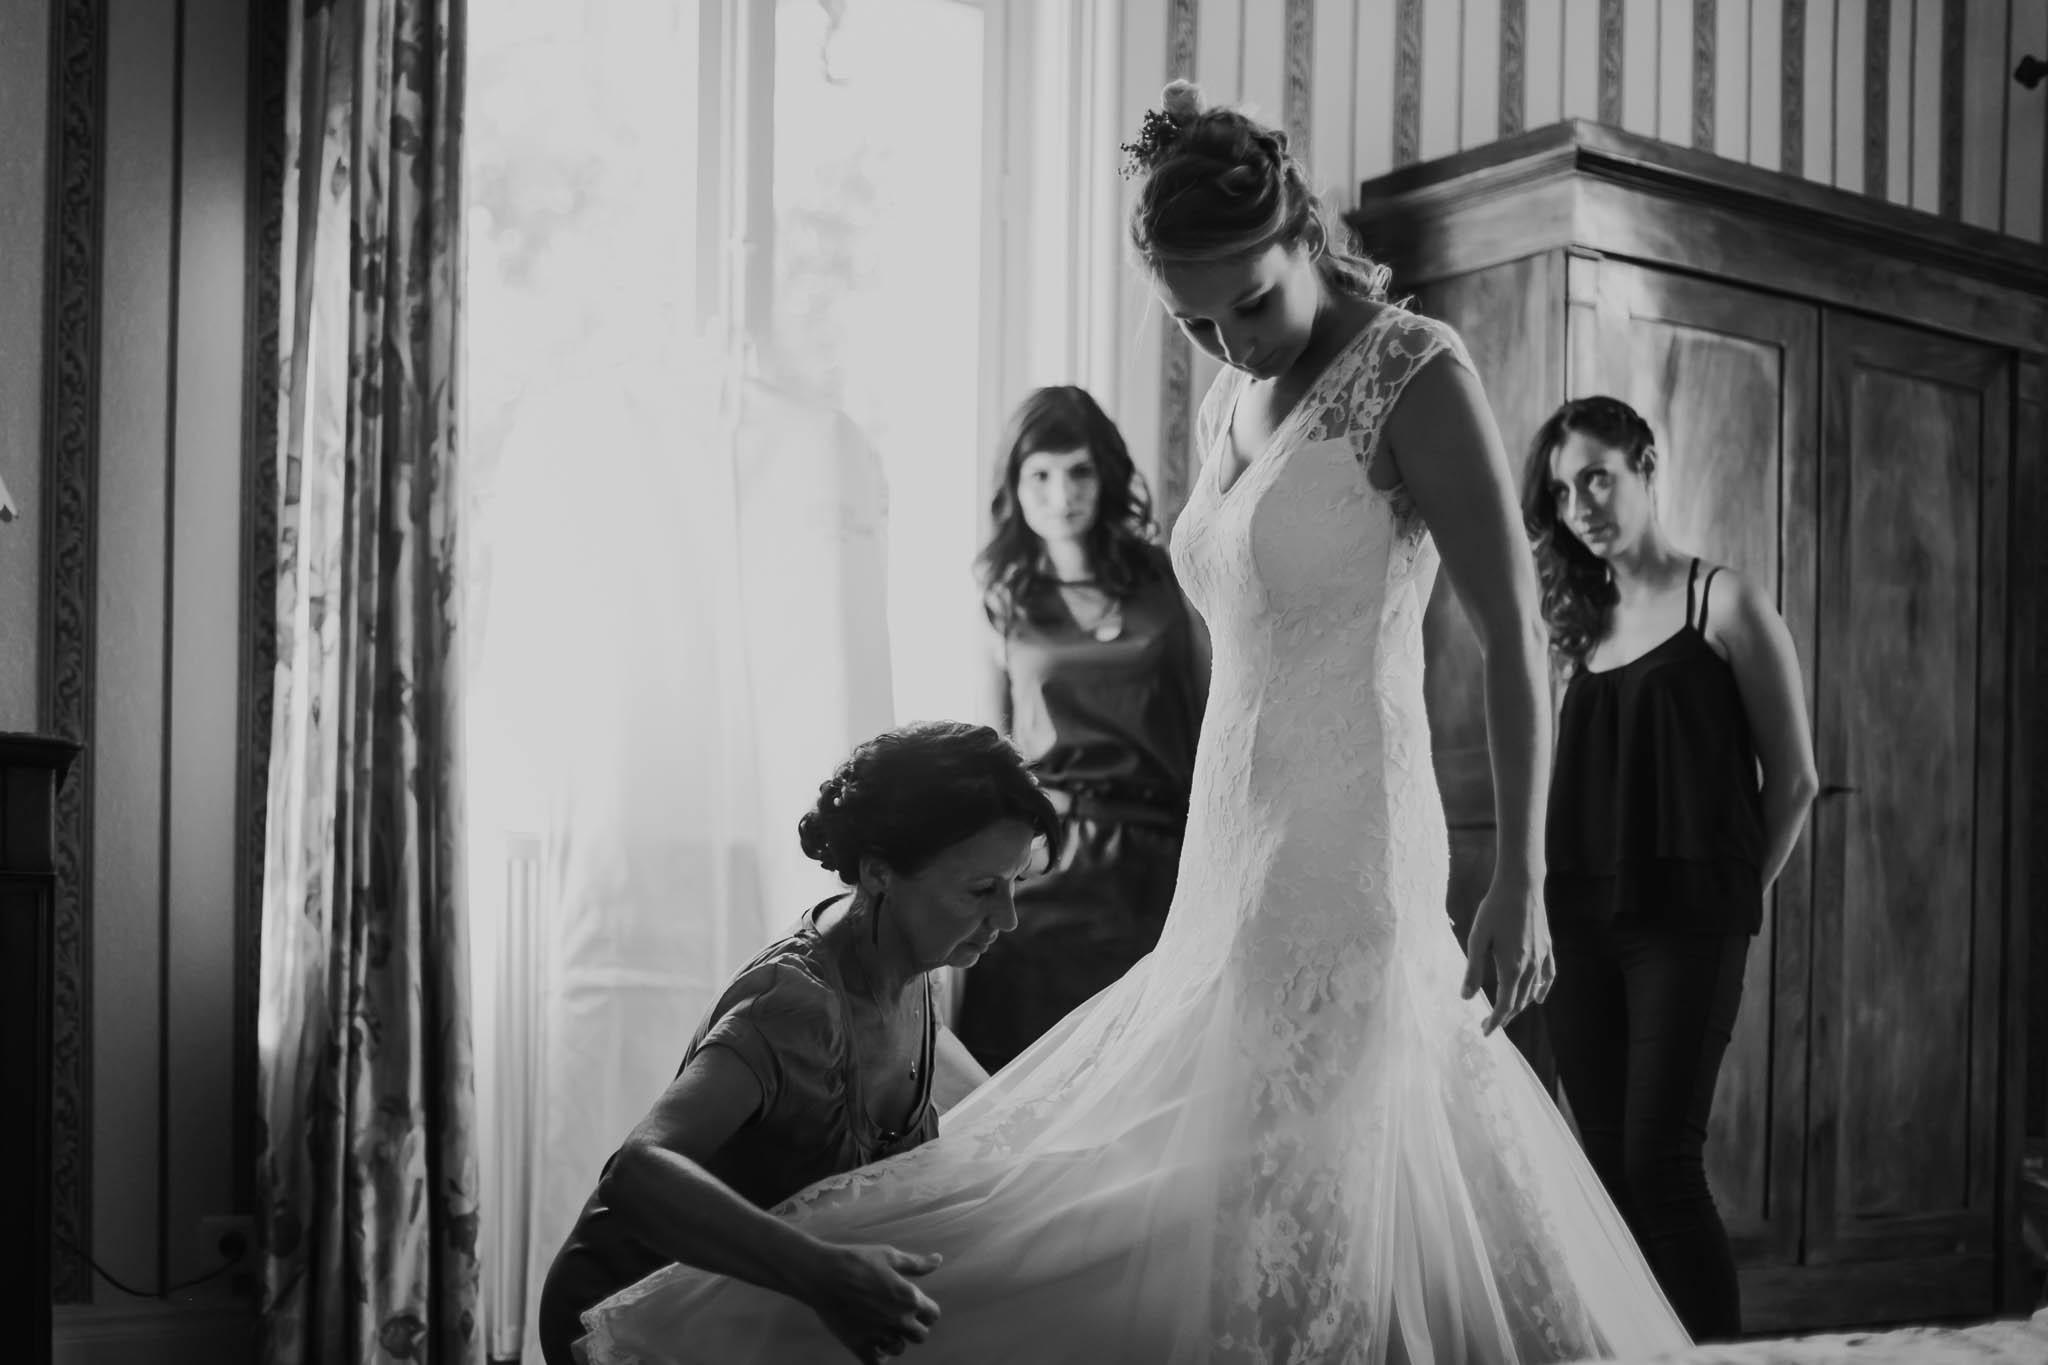 mariage-beaujolais-verbust-ingold-1.jpg